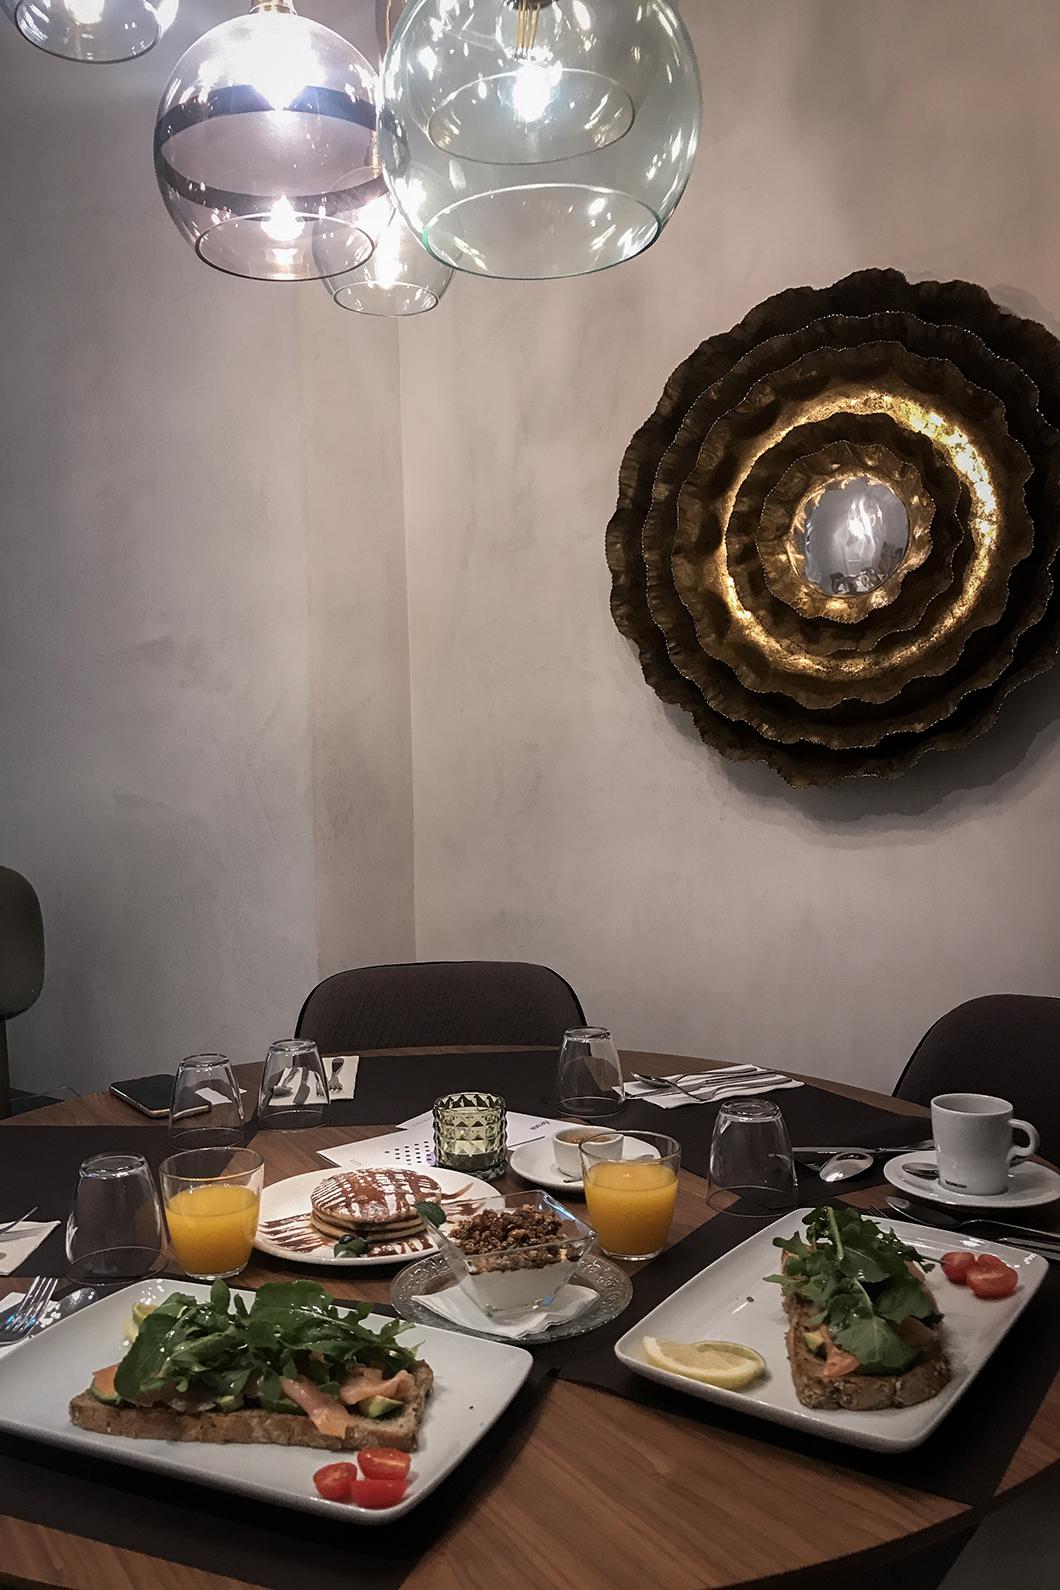 Prendre le petit déjeuner à l'Hotel Veintiuno